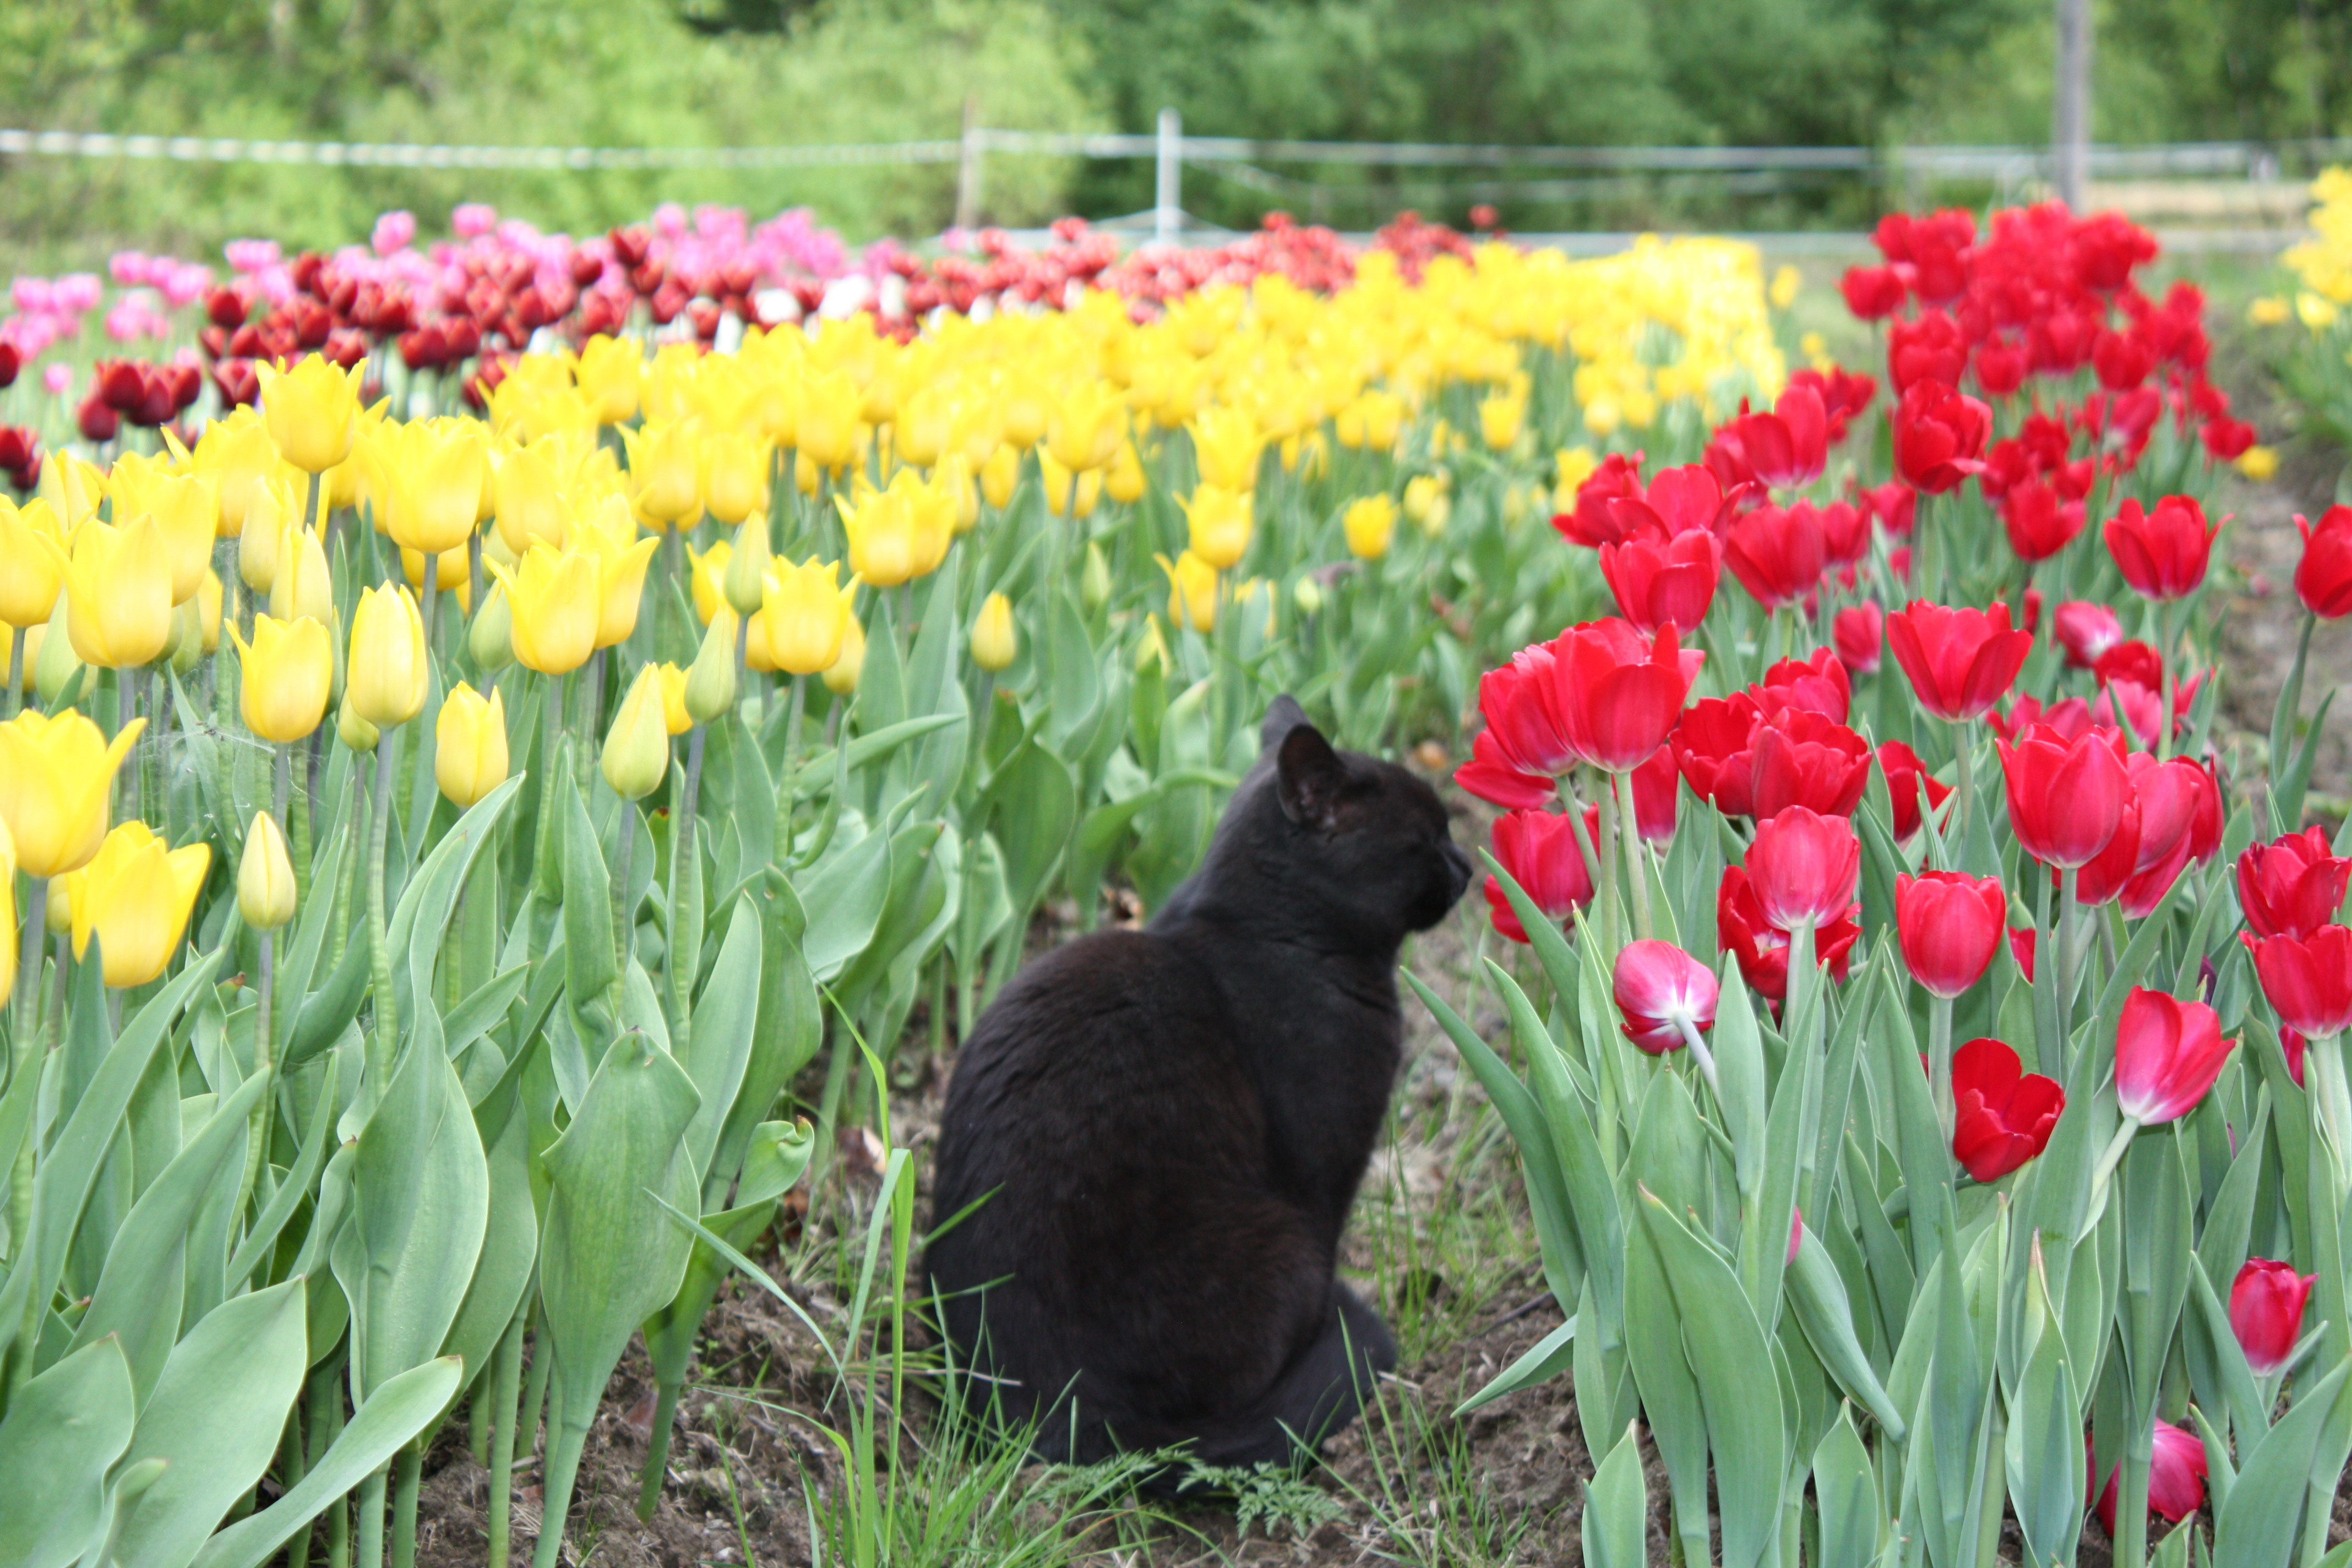 Picking tulip bulbs / tulpanlökar